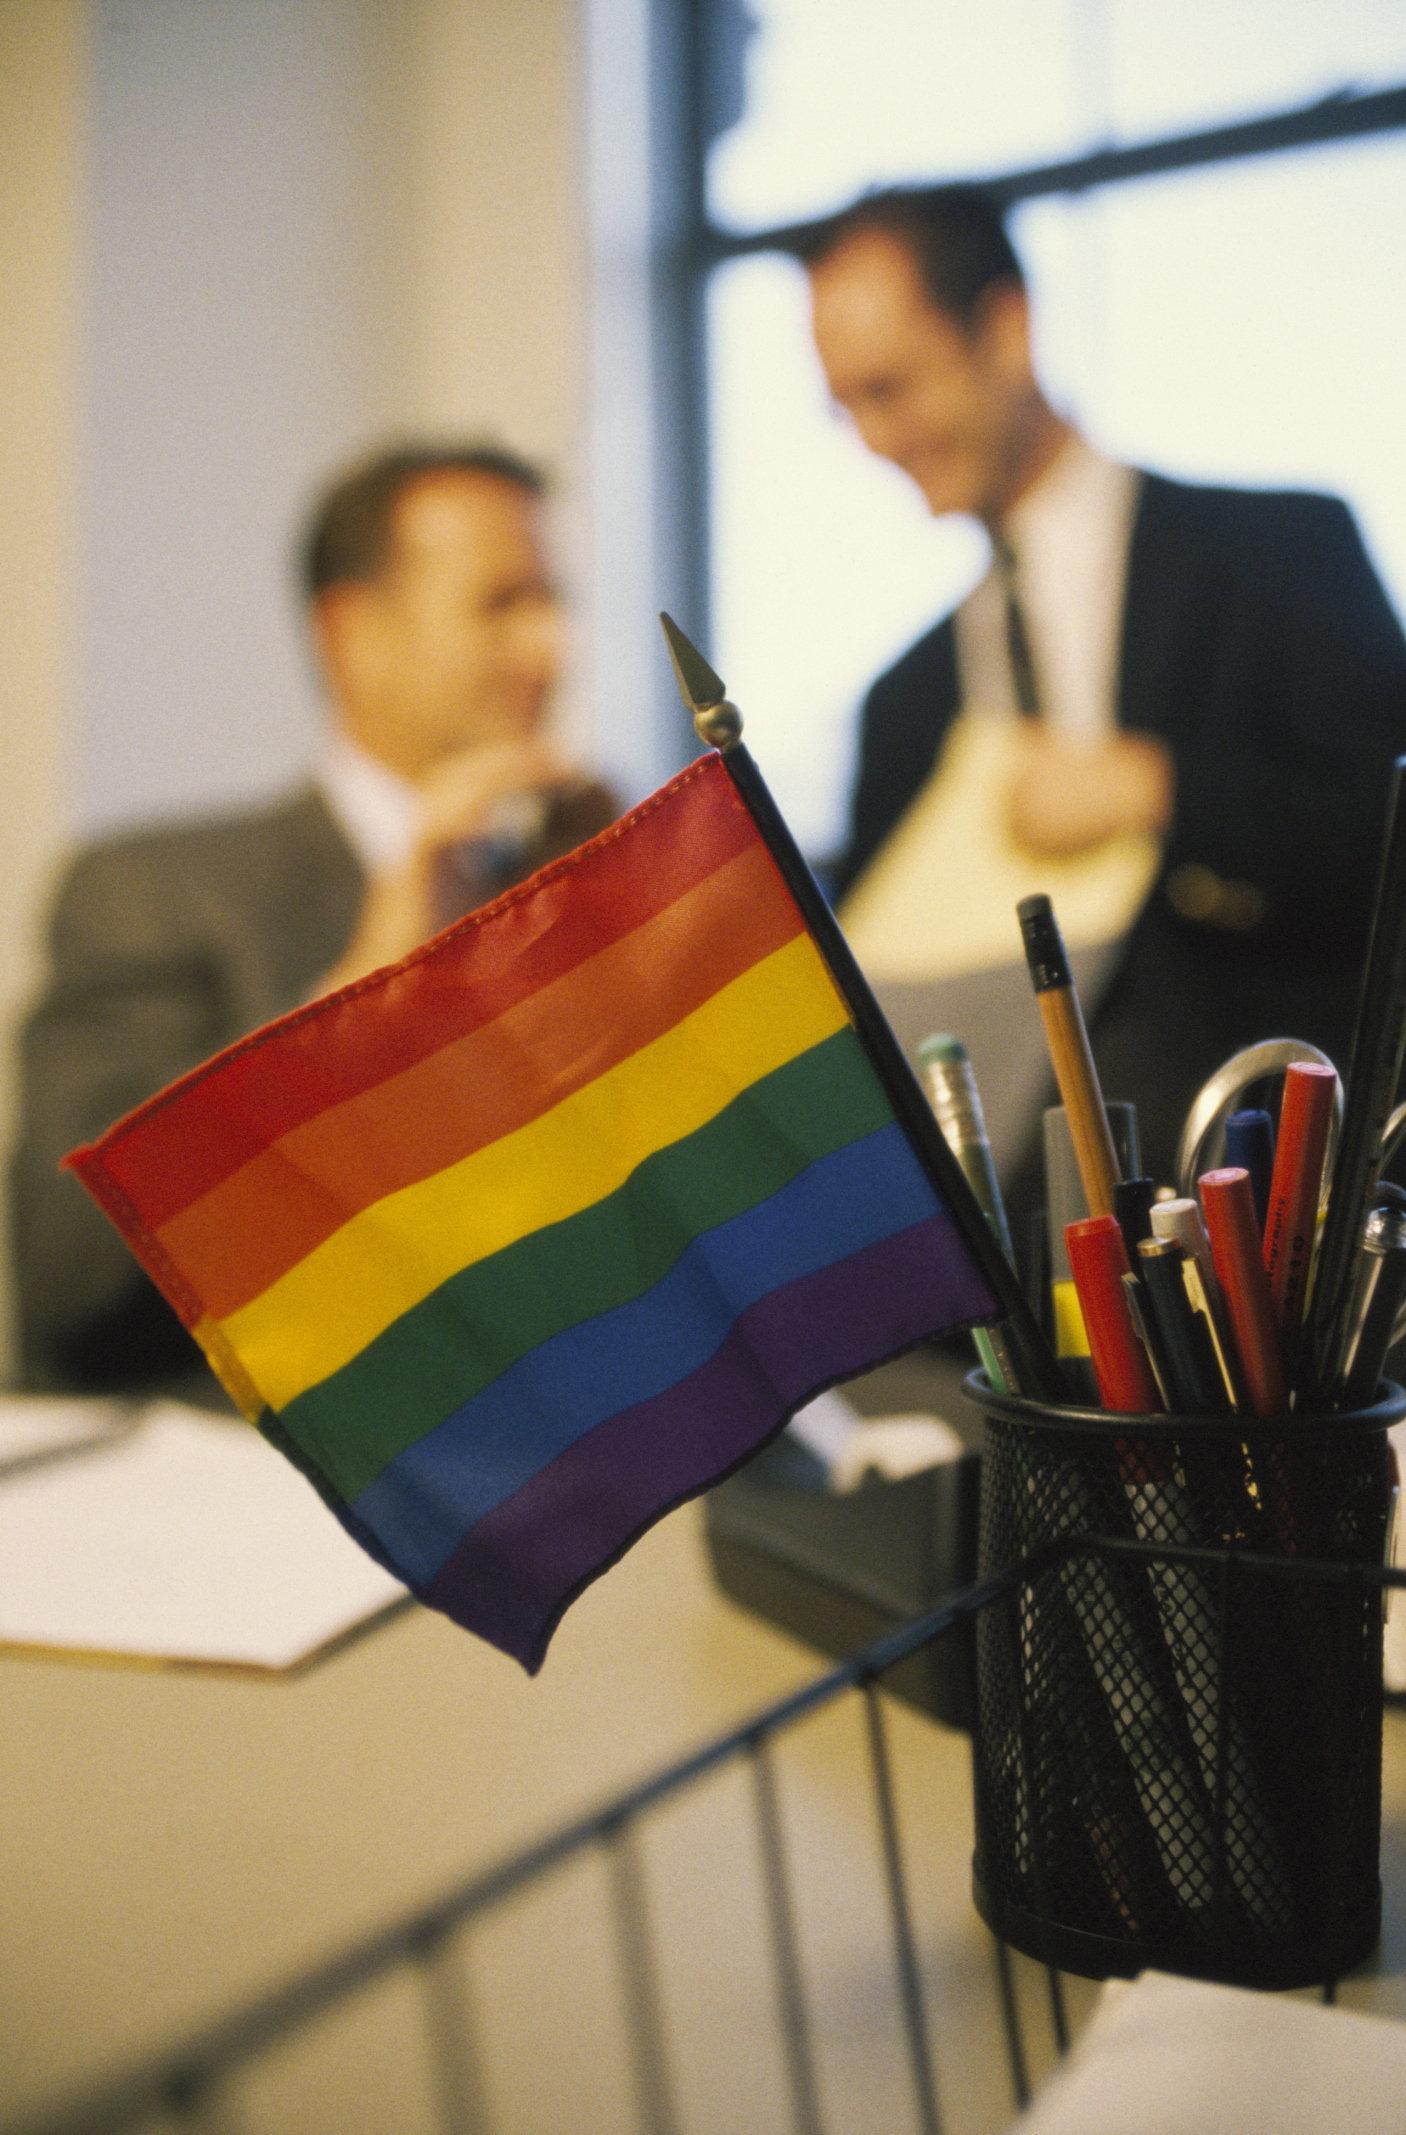 Rainbow flag in pencil holder on office desk